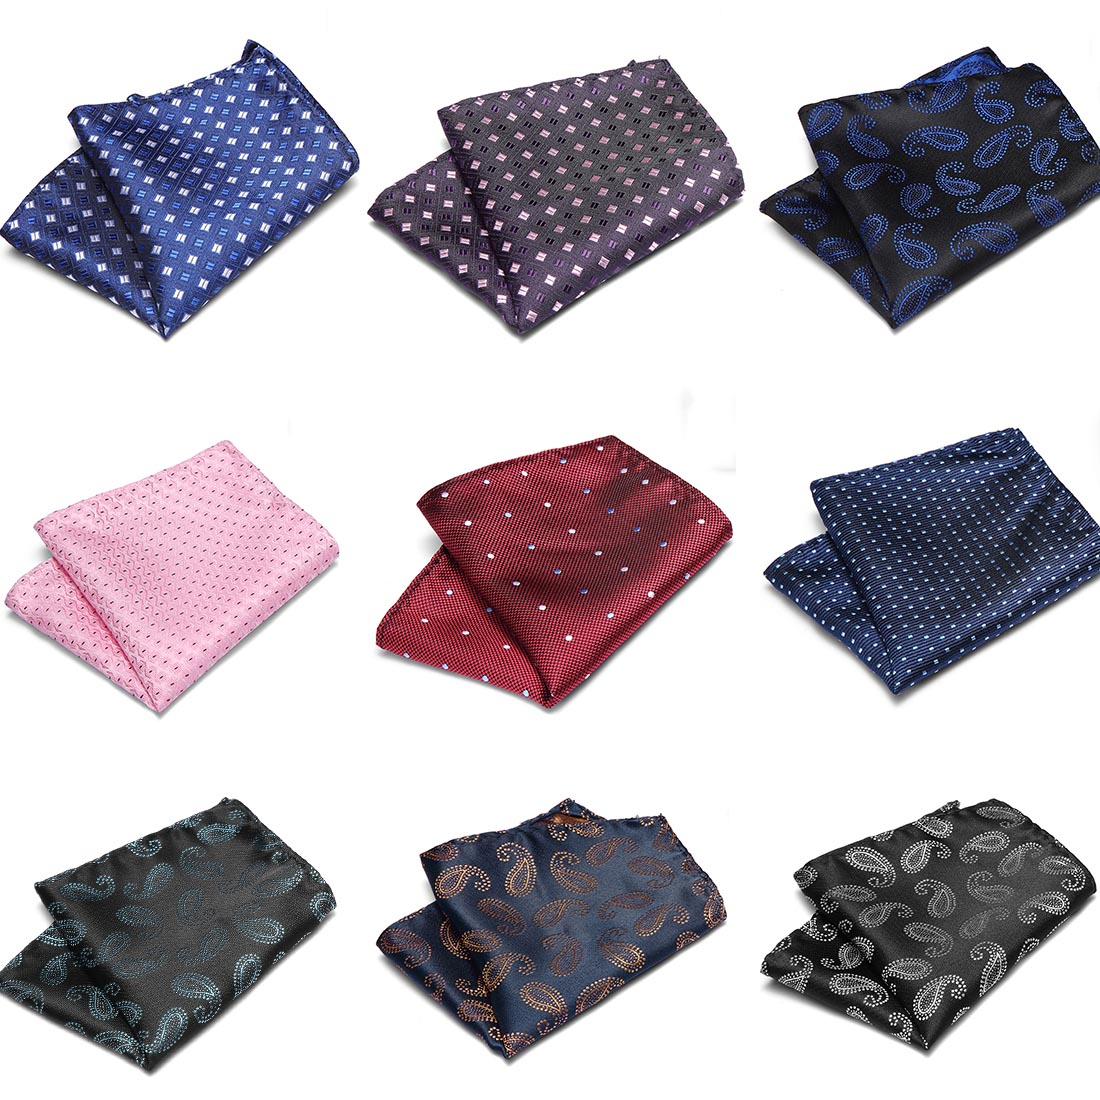 Luxury 22*22cm Men's Pocket Square 100% Silk Hankerchief Paisley Dot Floral Hanky Wedding Party Gift Paisley Design